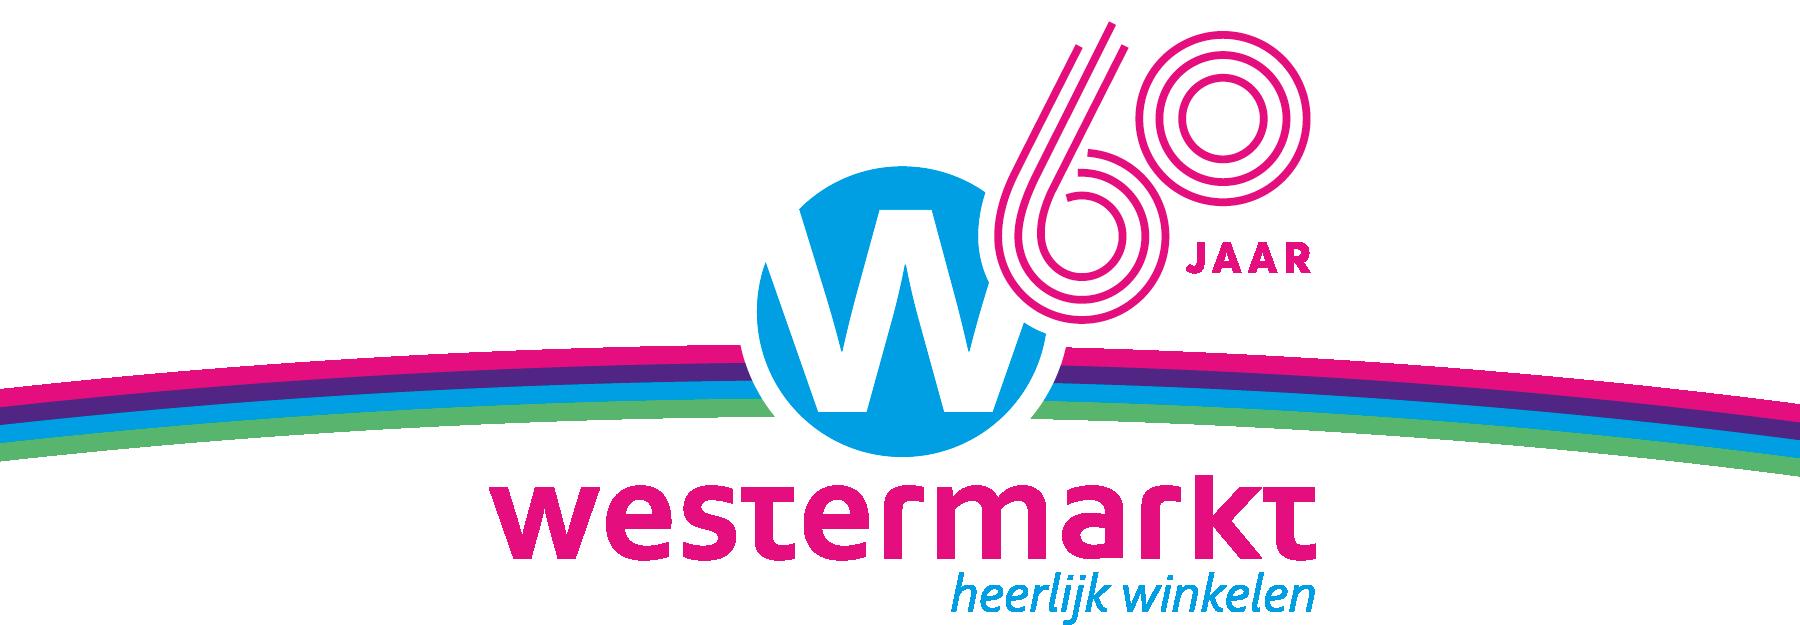 dark logo